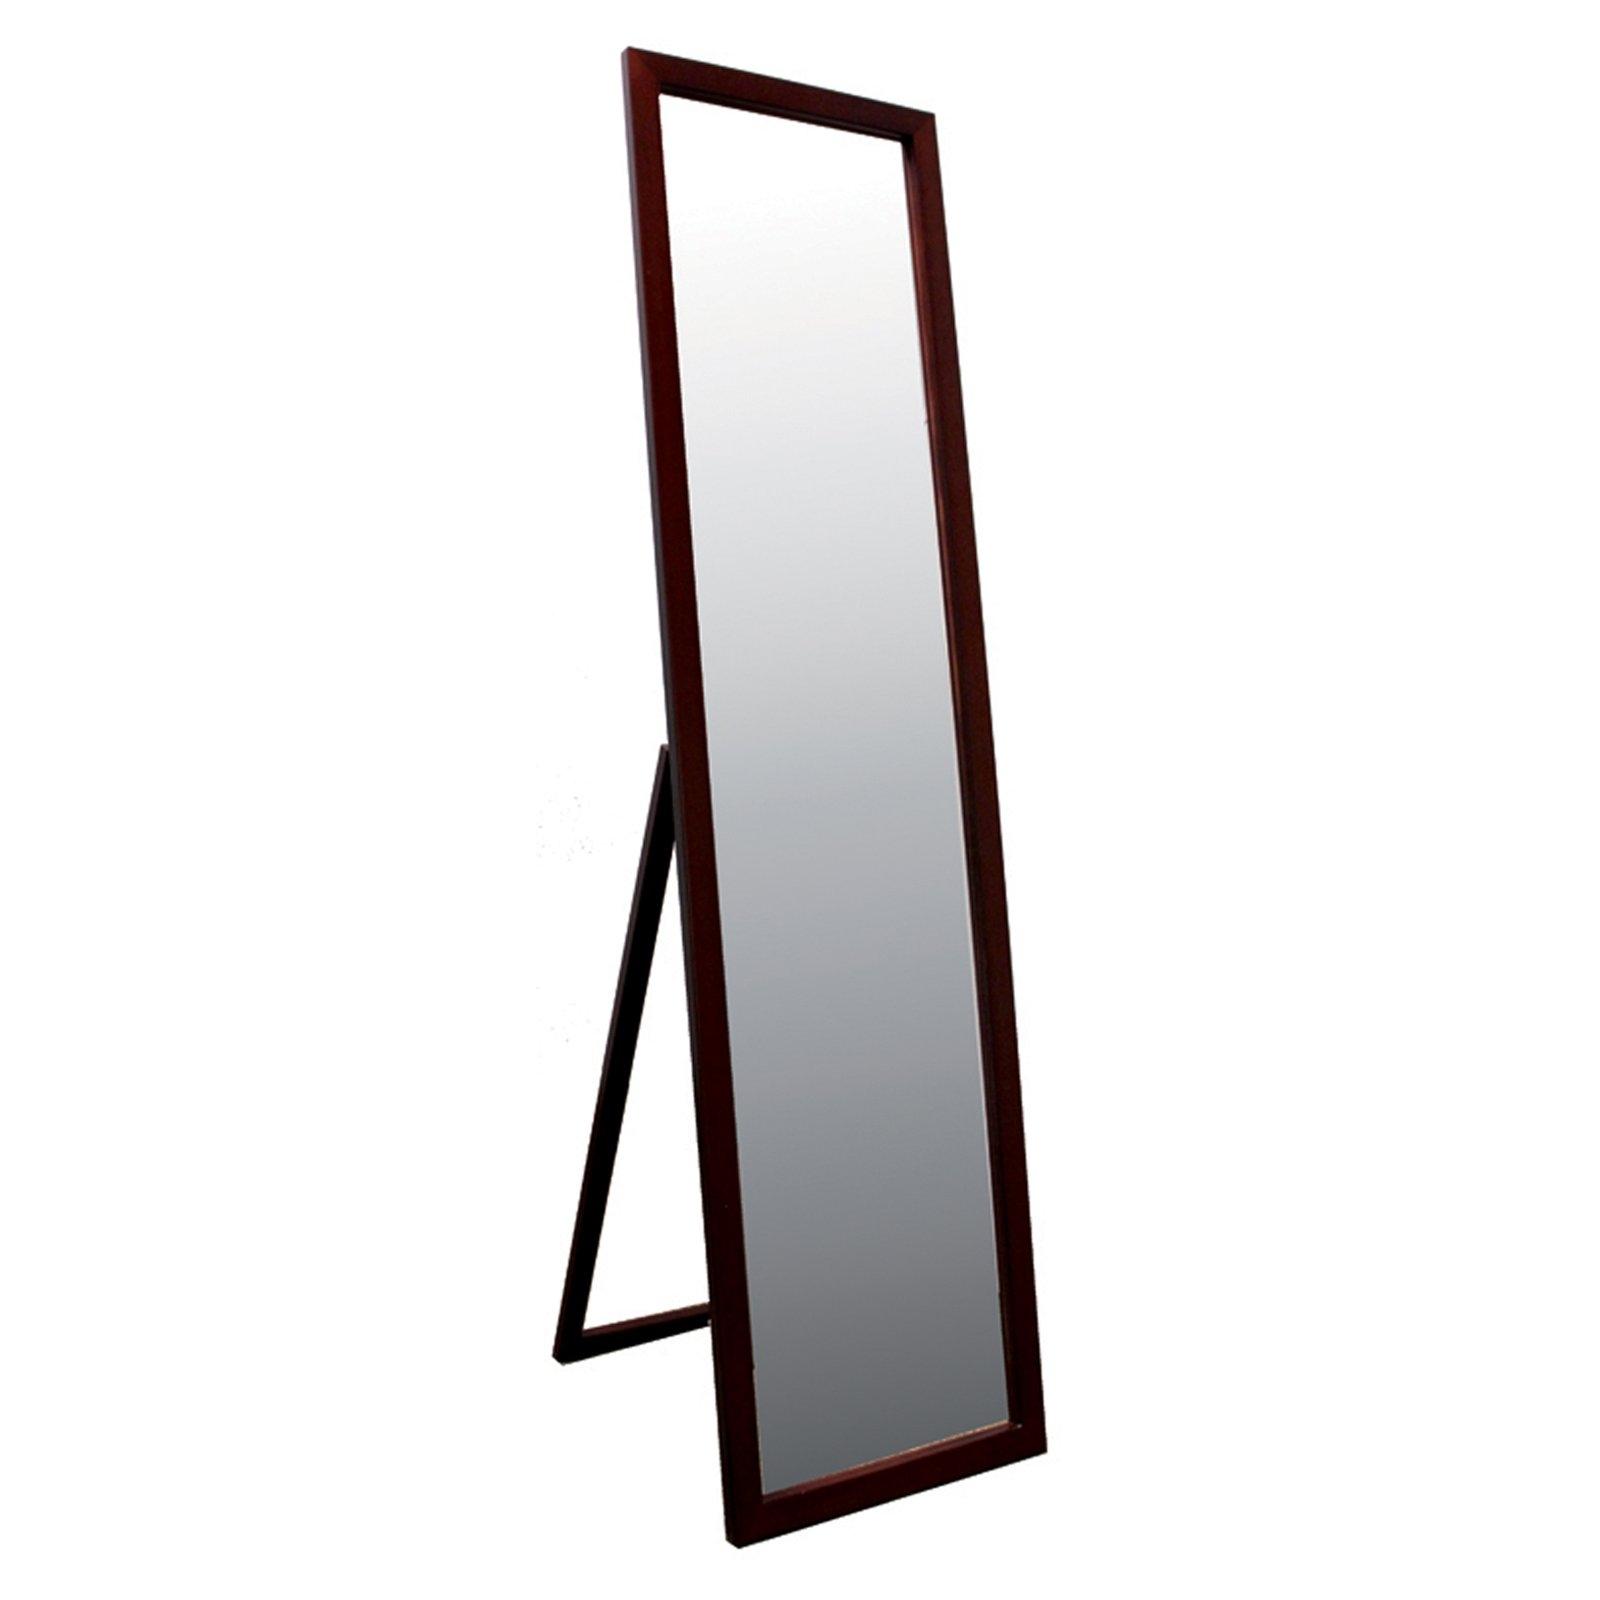 Full Length Stand Alone Mirrors Inside Full Length Stand Alone Mirrors (Image 12 of 15)